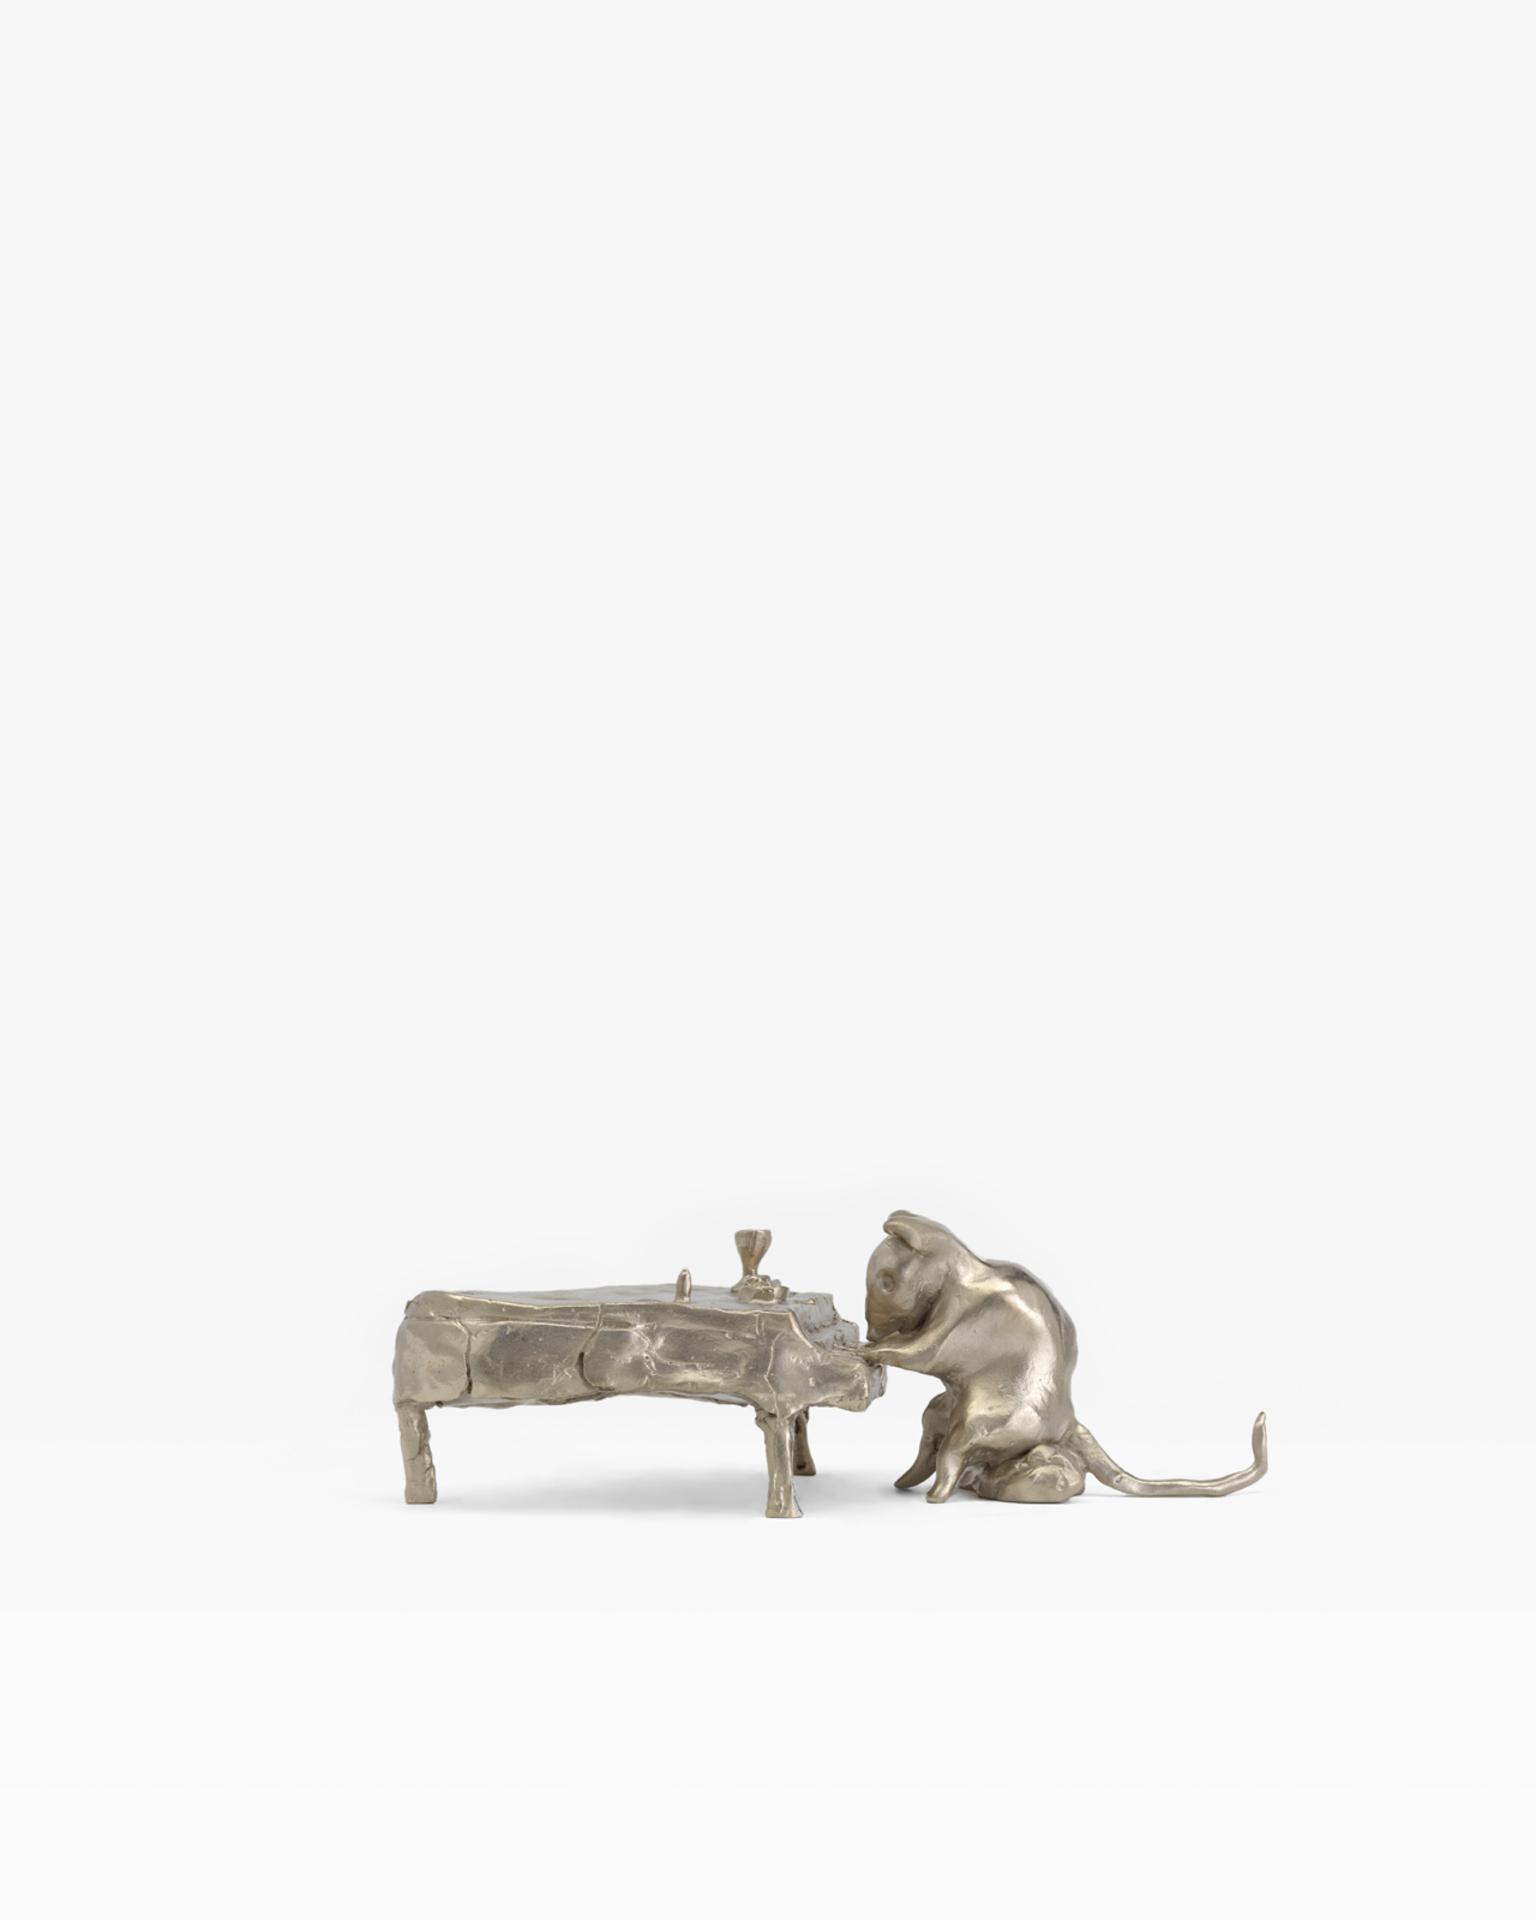 Rat Playing Piano